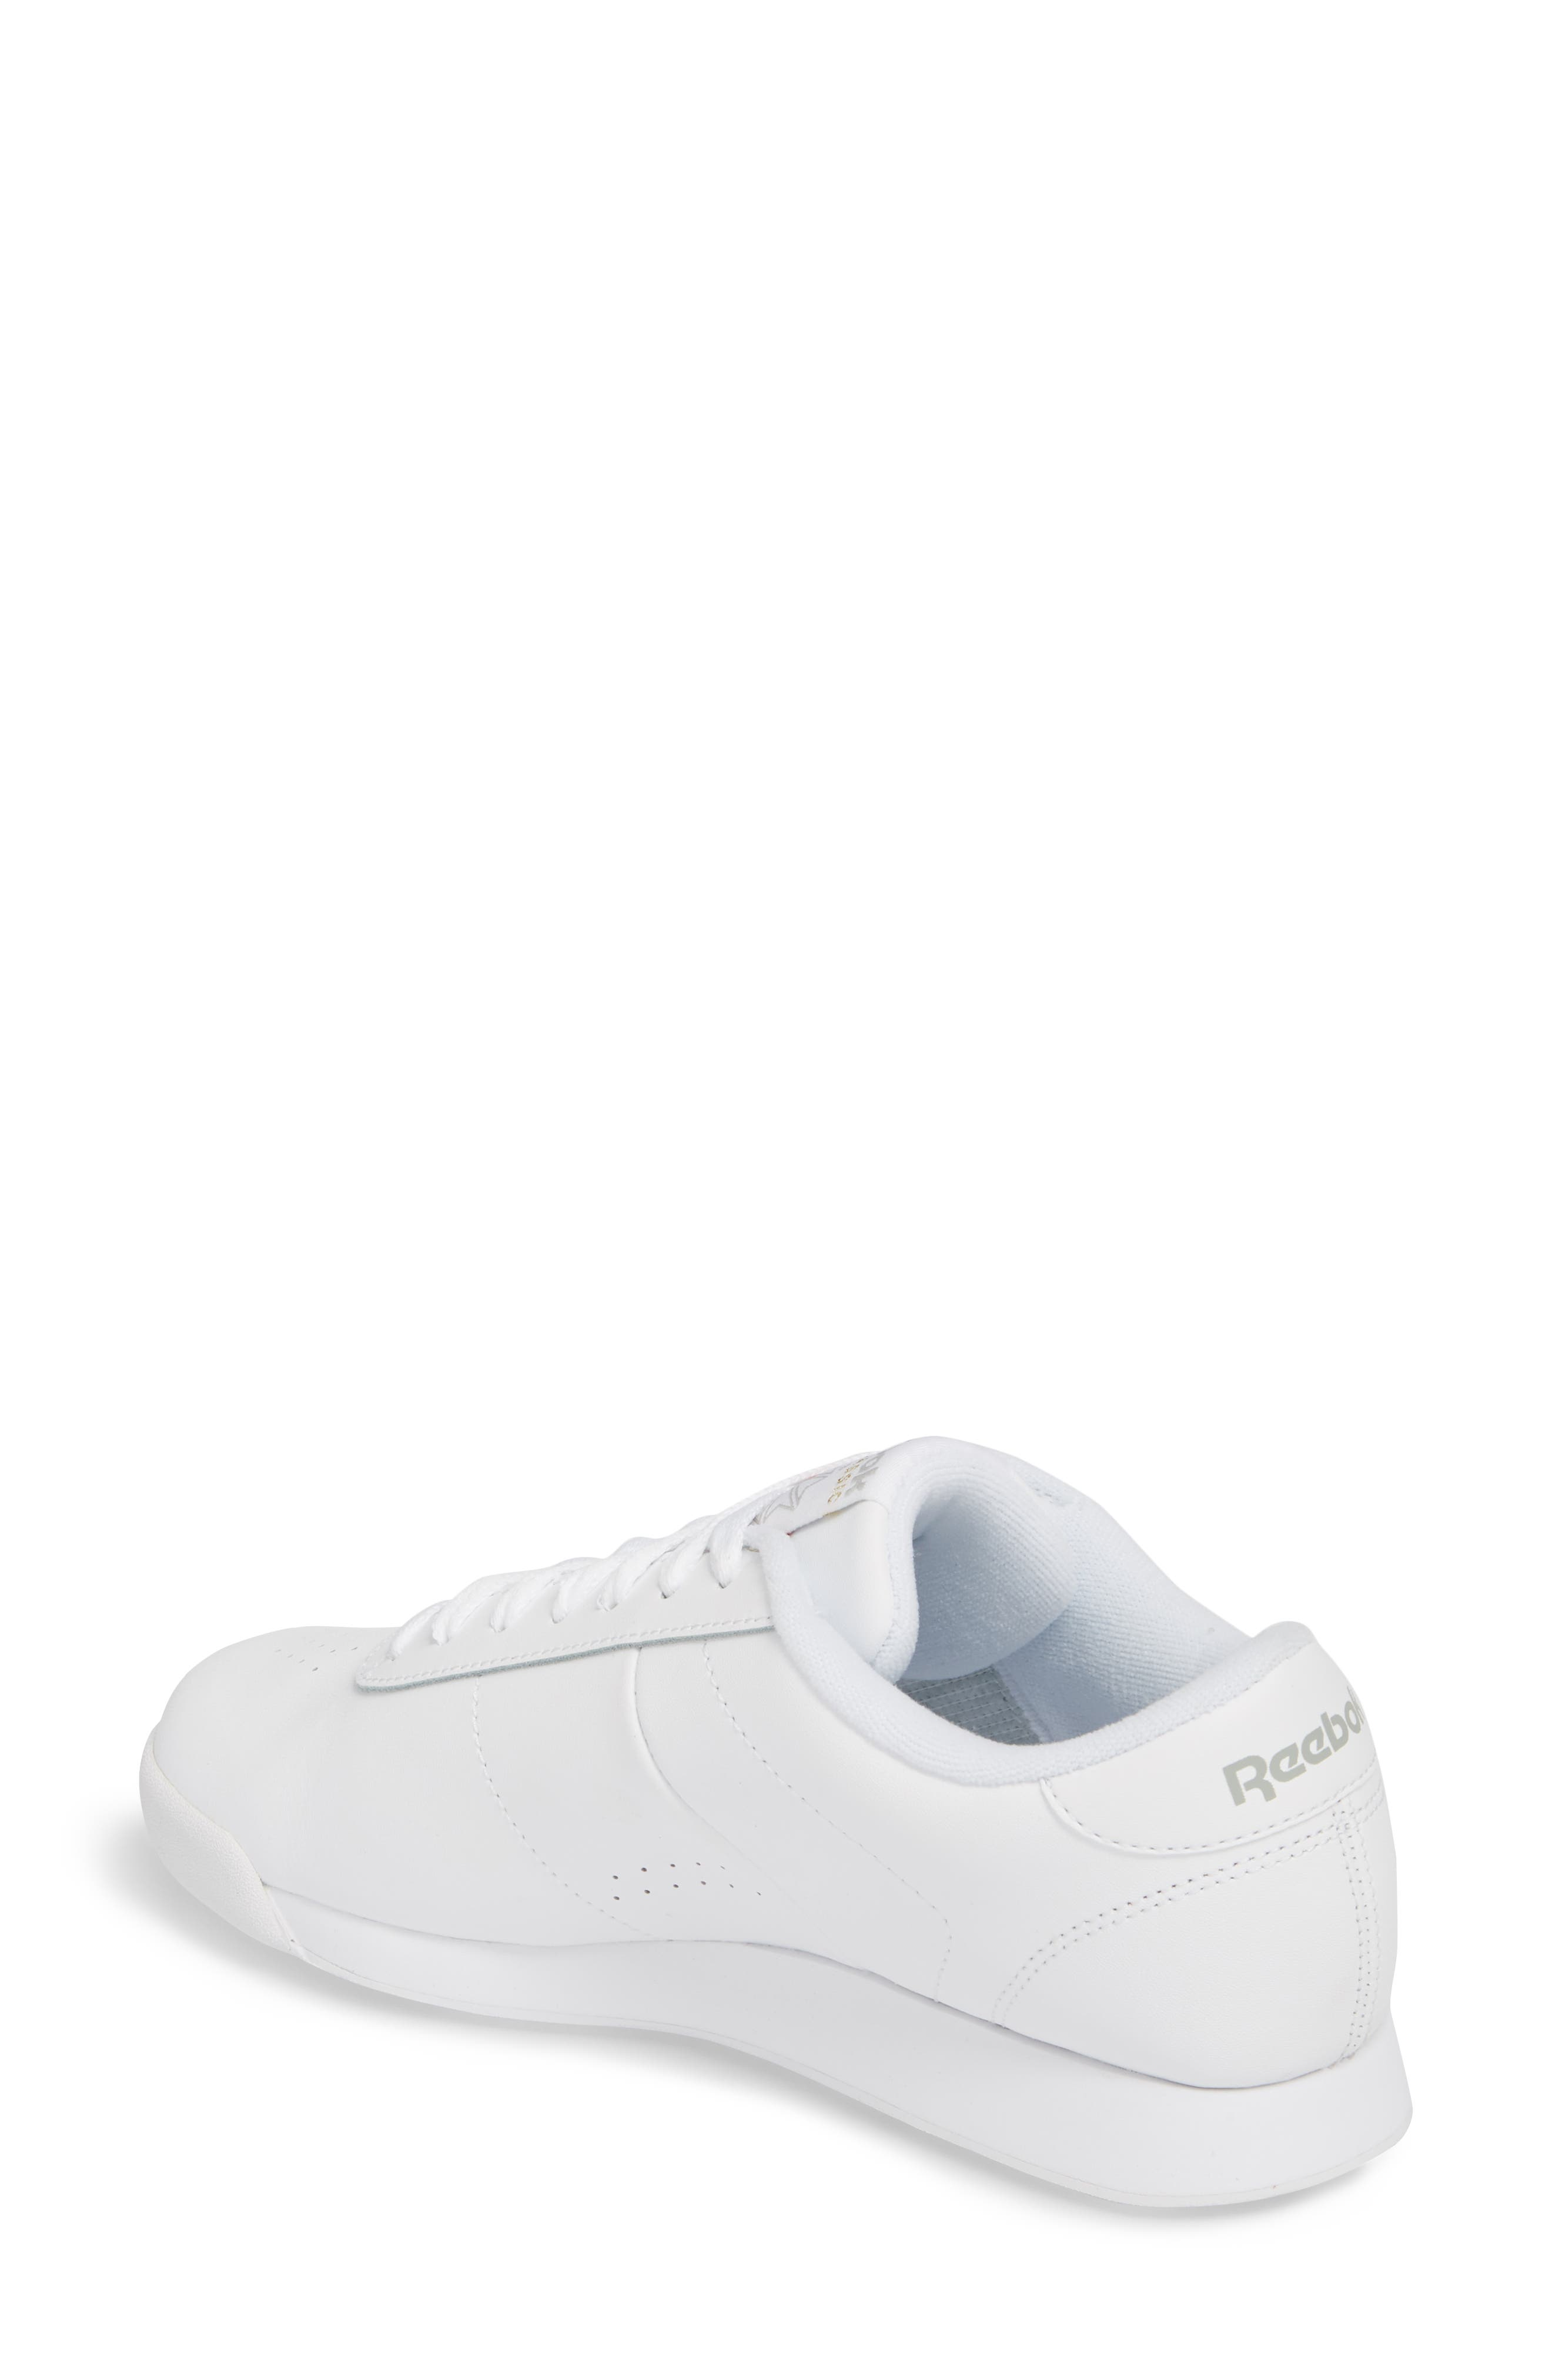 Princess Sneaker,                             Alternate thumbnail 2, color,                             WHITE